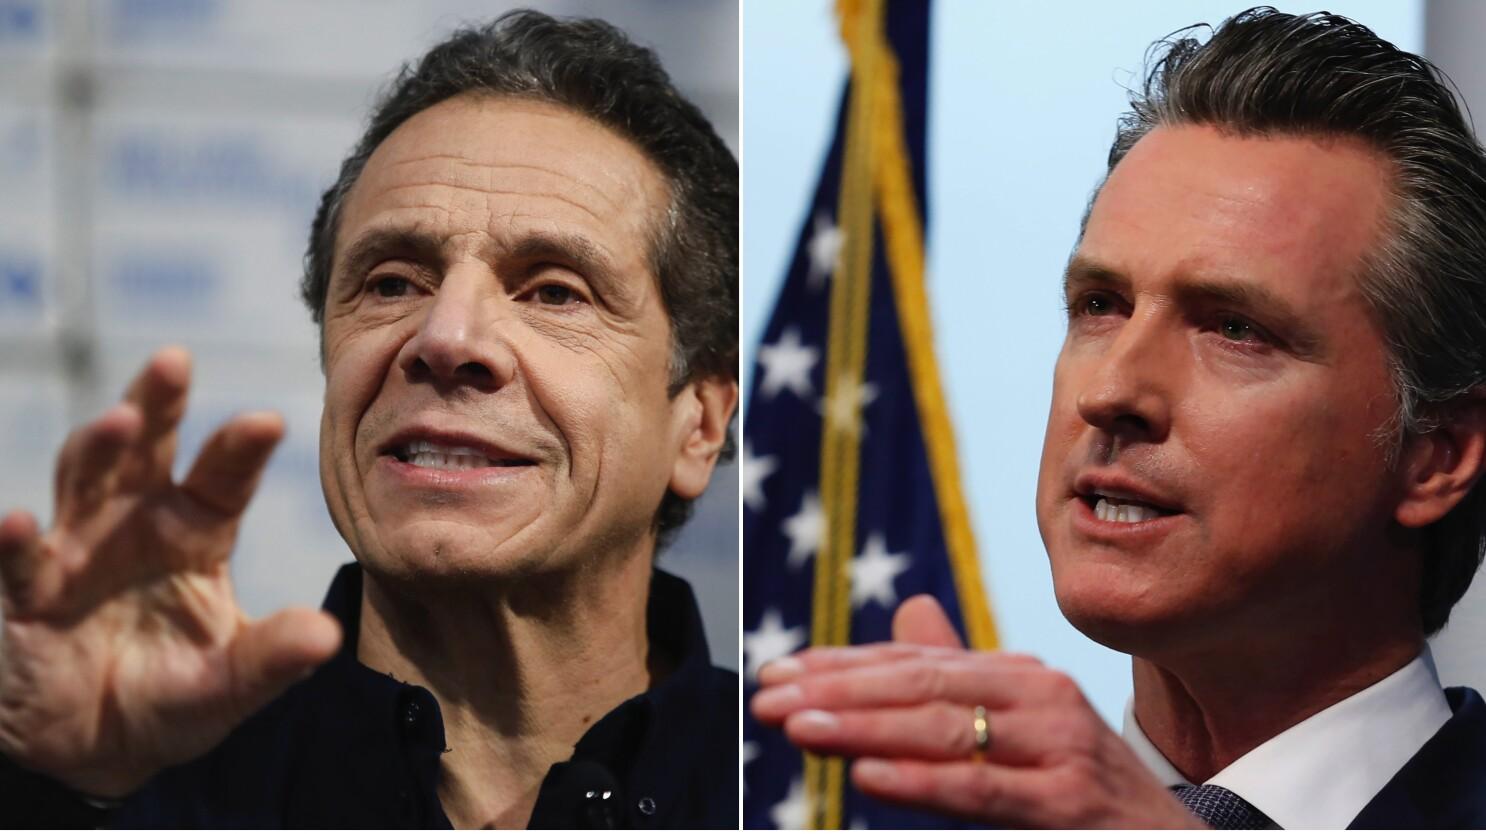 Coronavirus turns Cuomo and Newsom into 'America's governors' - Los Angeles Times